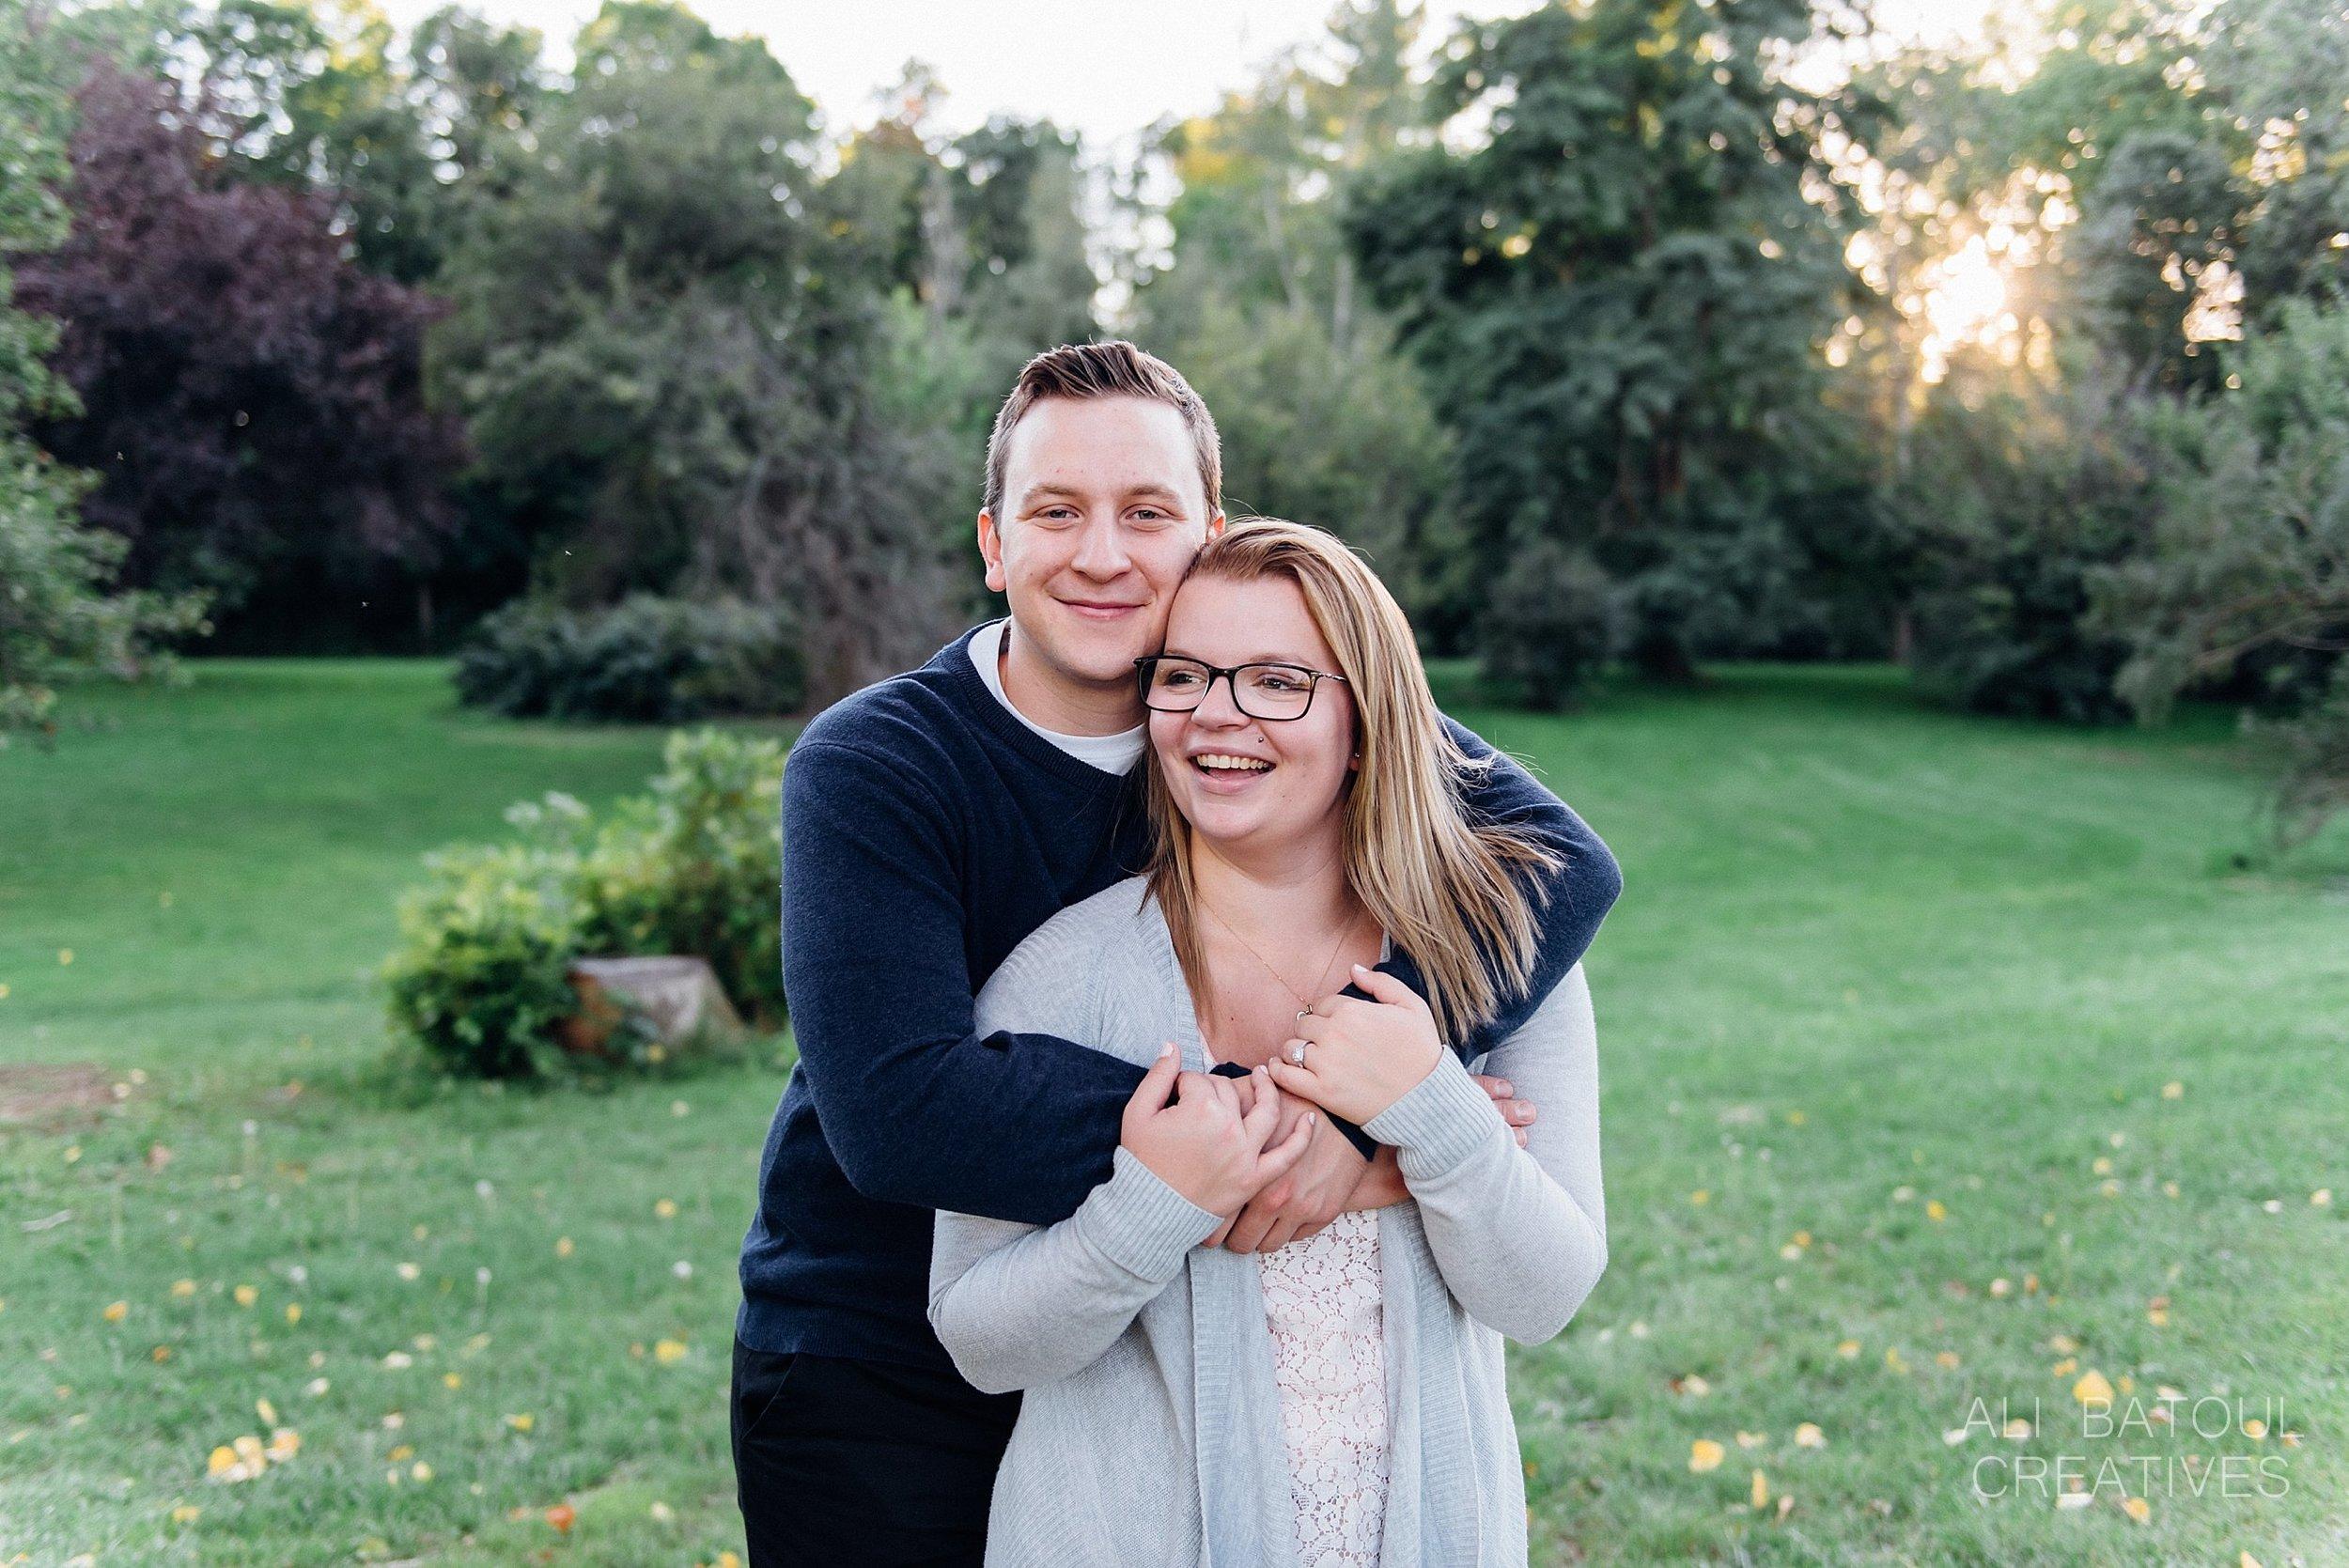 Natasha + Rich Ottawa Arboretum Engagement Photos - Ali and Batoul Fine Art Wedding Photography_0025.jpg